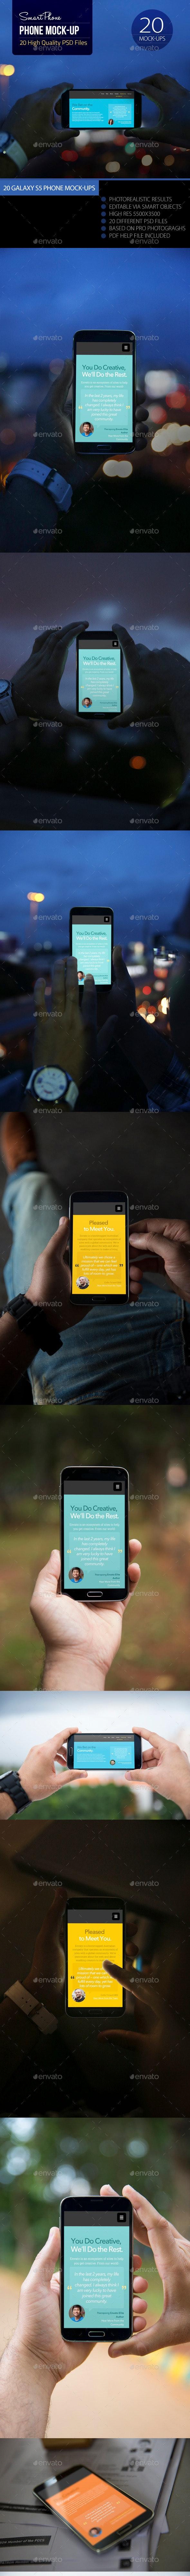 Phone Mock-Up - Mobile Displays